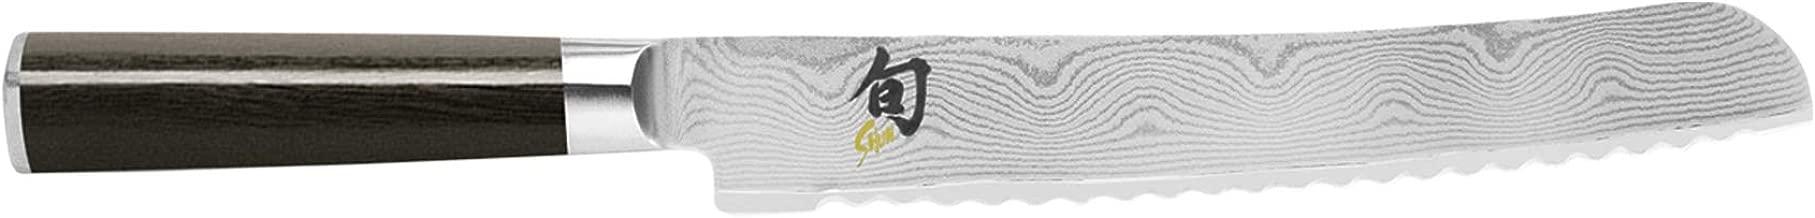 Kai Shun Classic Bread Kitchen Knife 22.9cm, Stainless Steel, DM0705